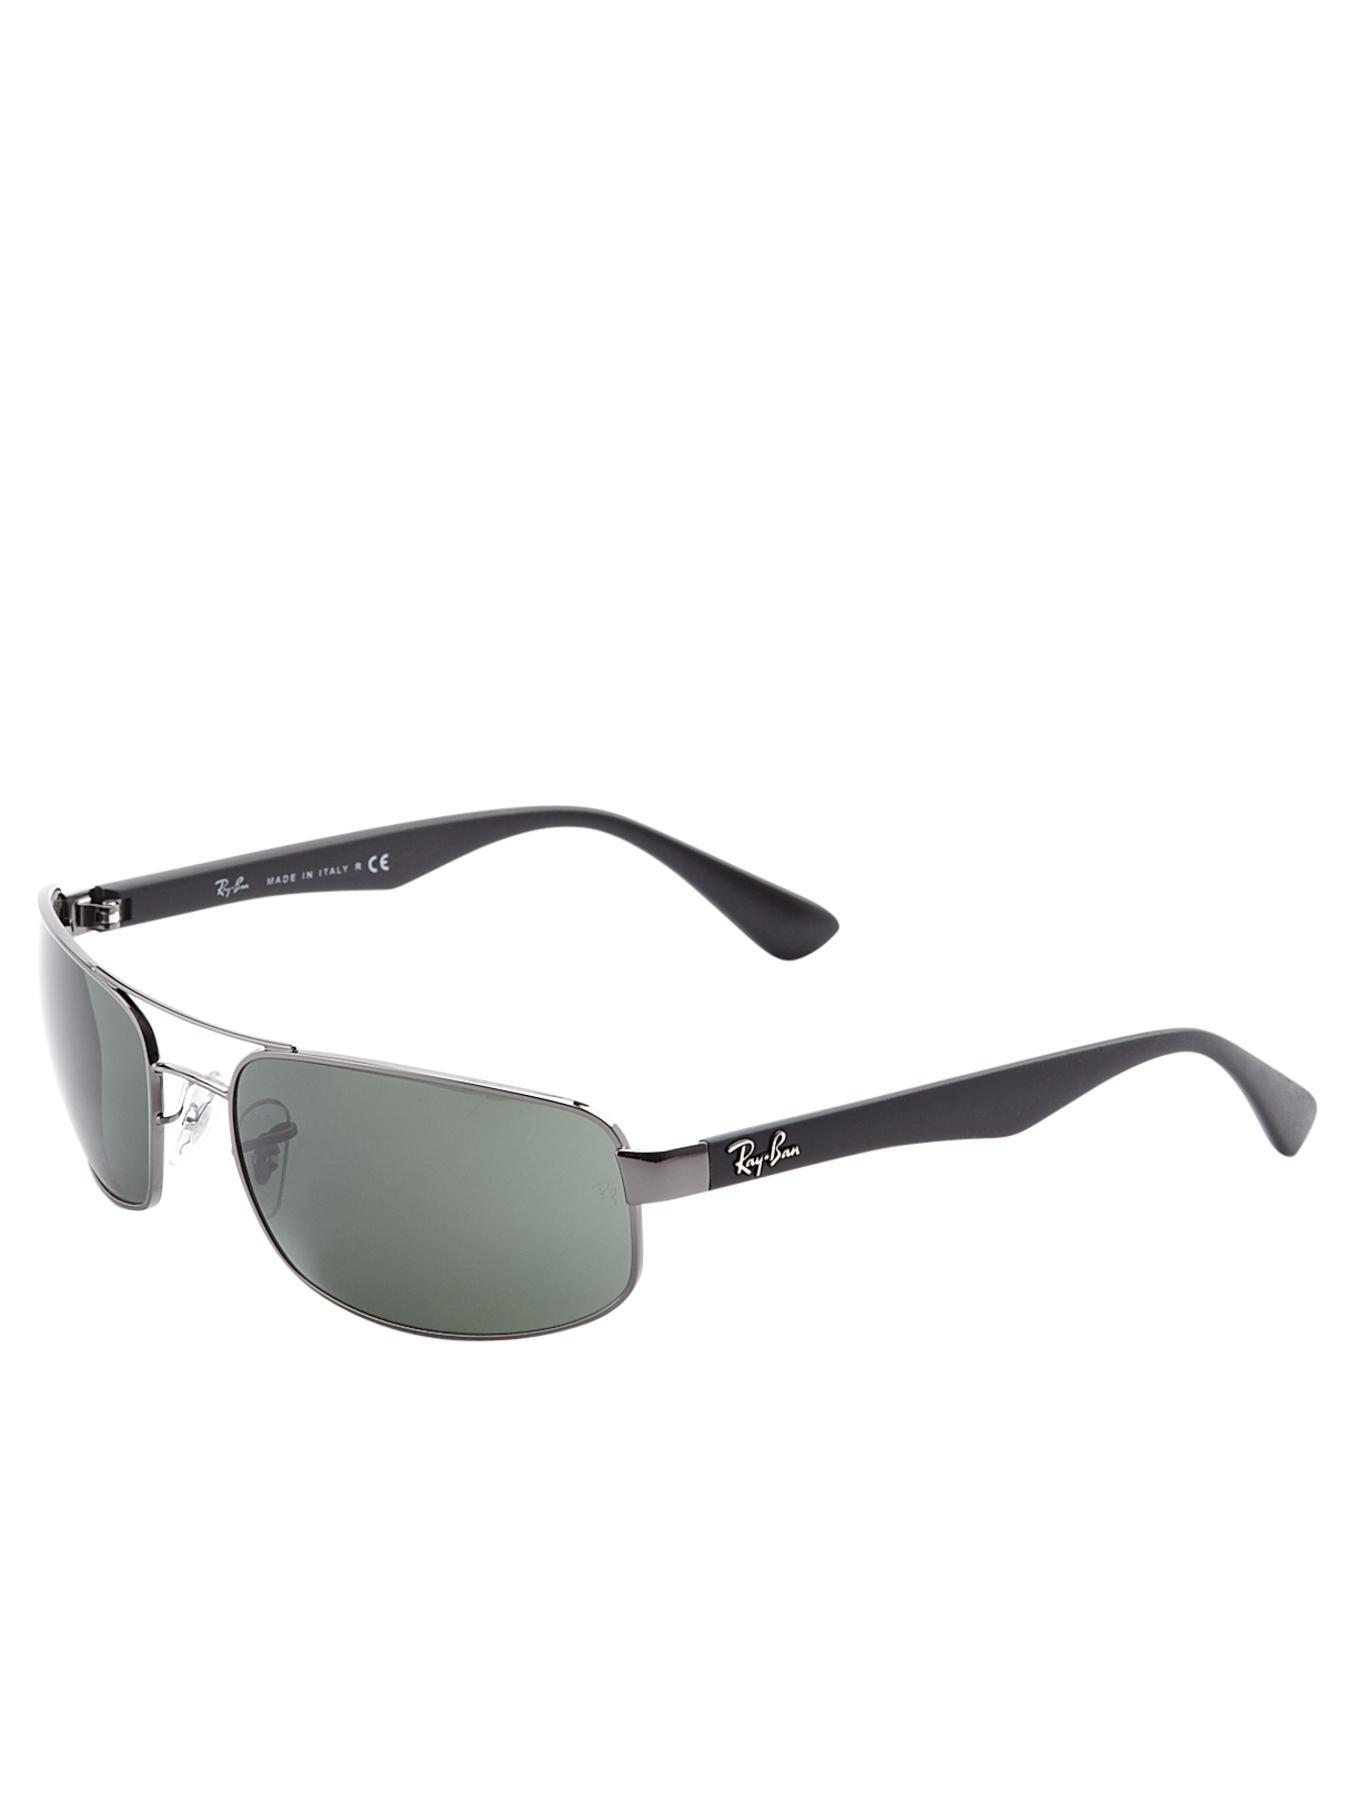 ray ban clubmaster sunglasses ireland  ray ban sunglasses